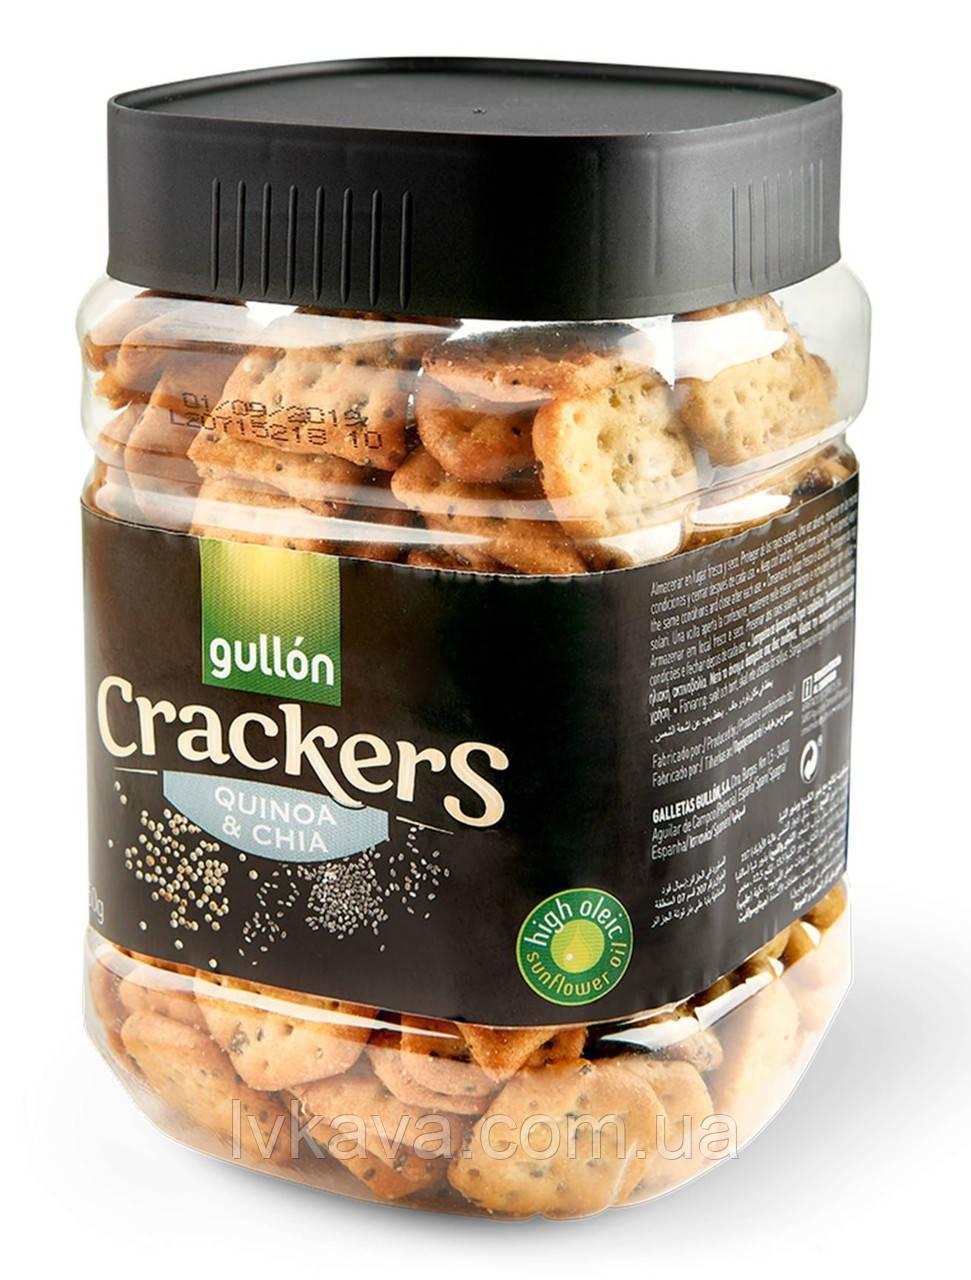 Крекер  Gullon Crackers quinoa & chia, 250 гр